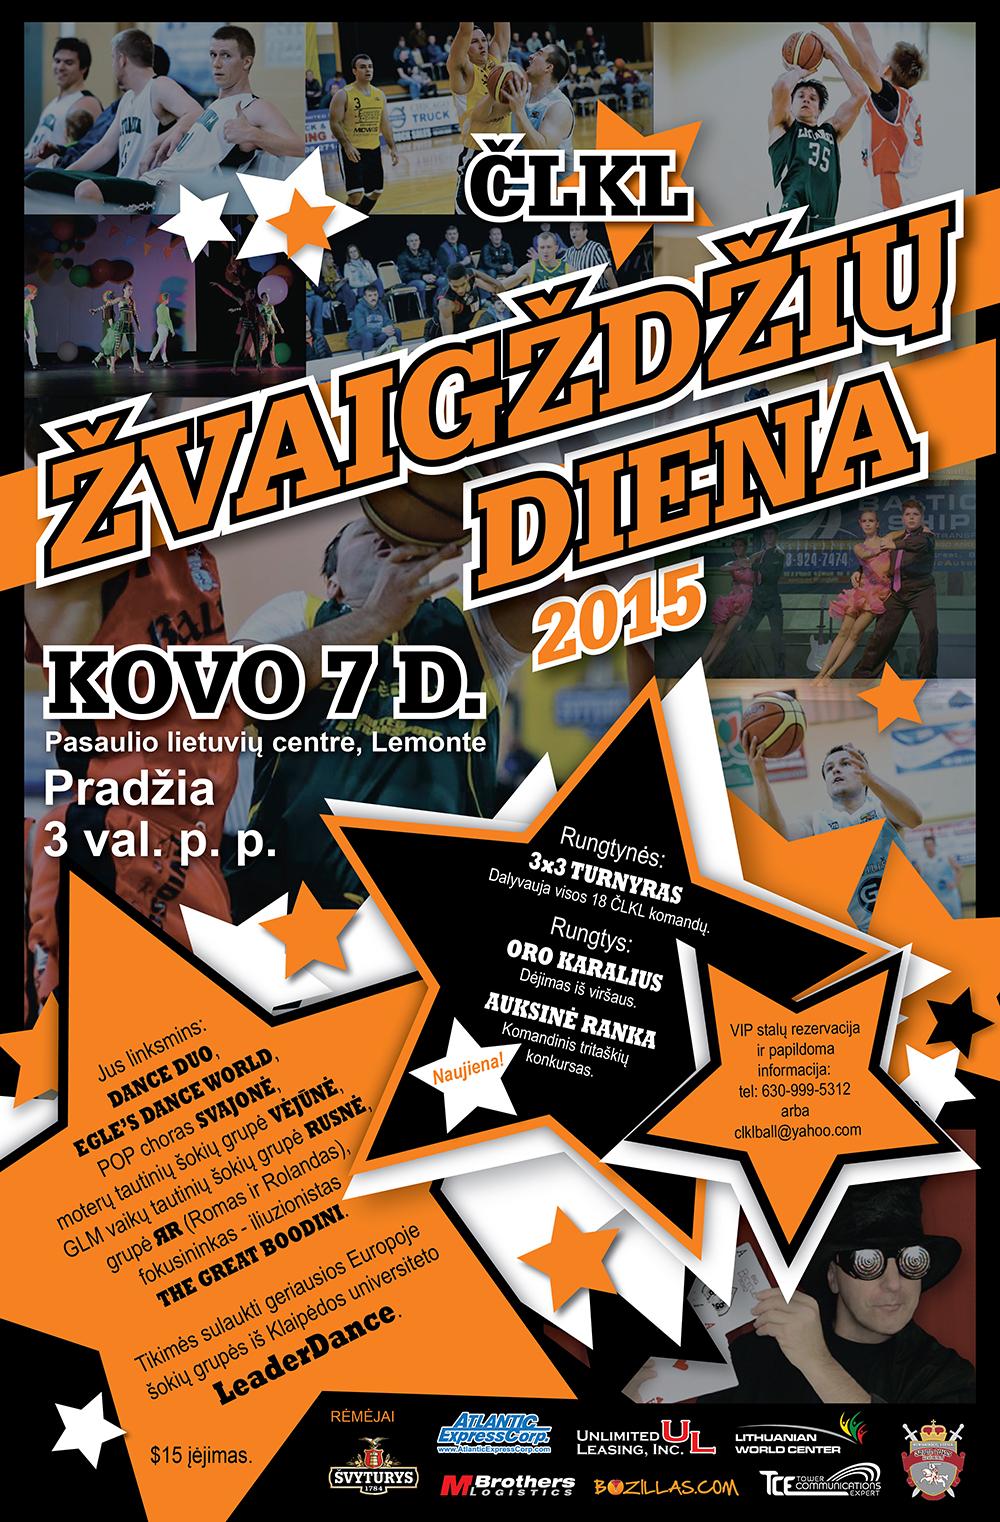 Zvaigzdziu-diena-2015-Final